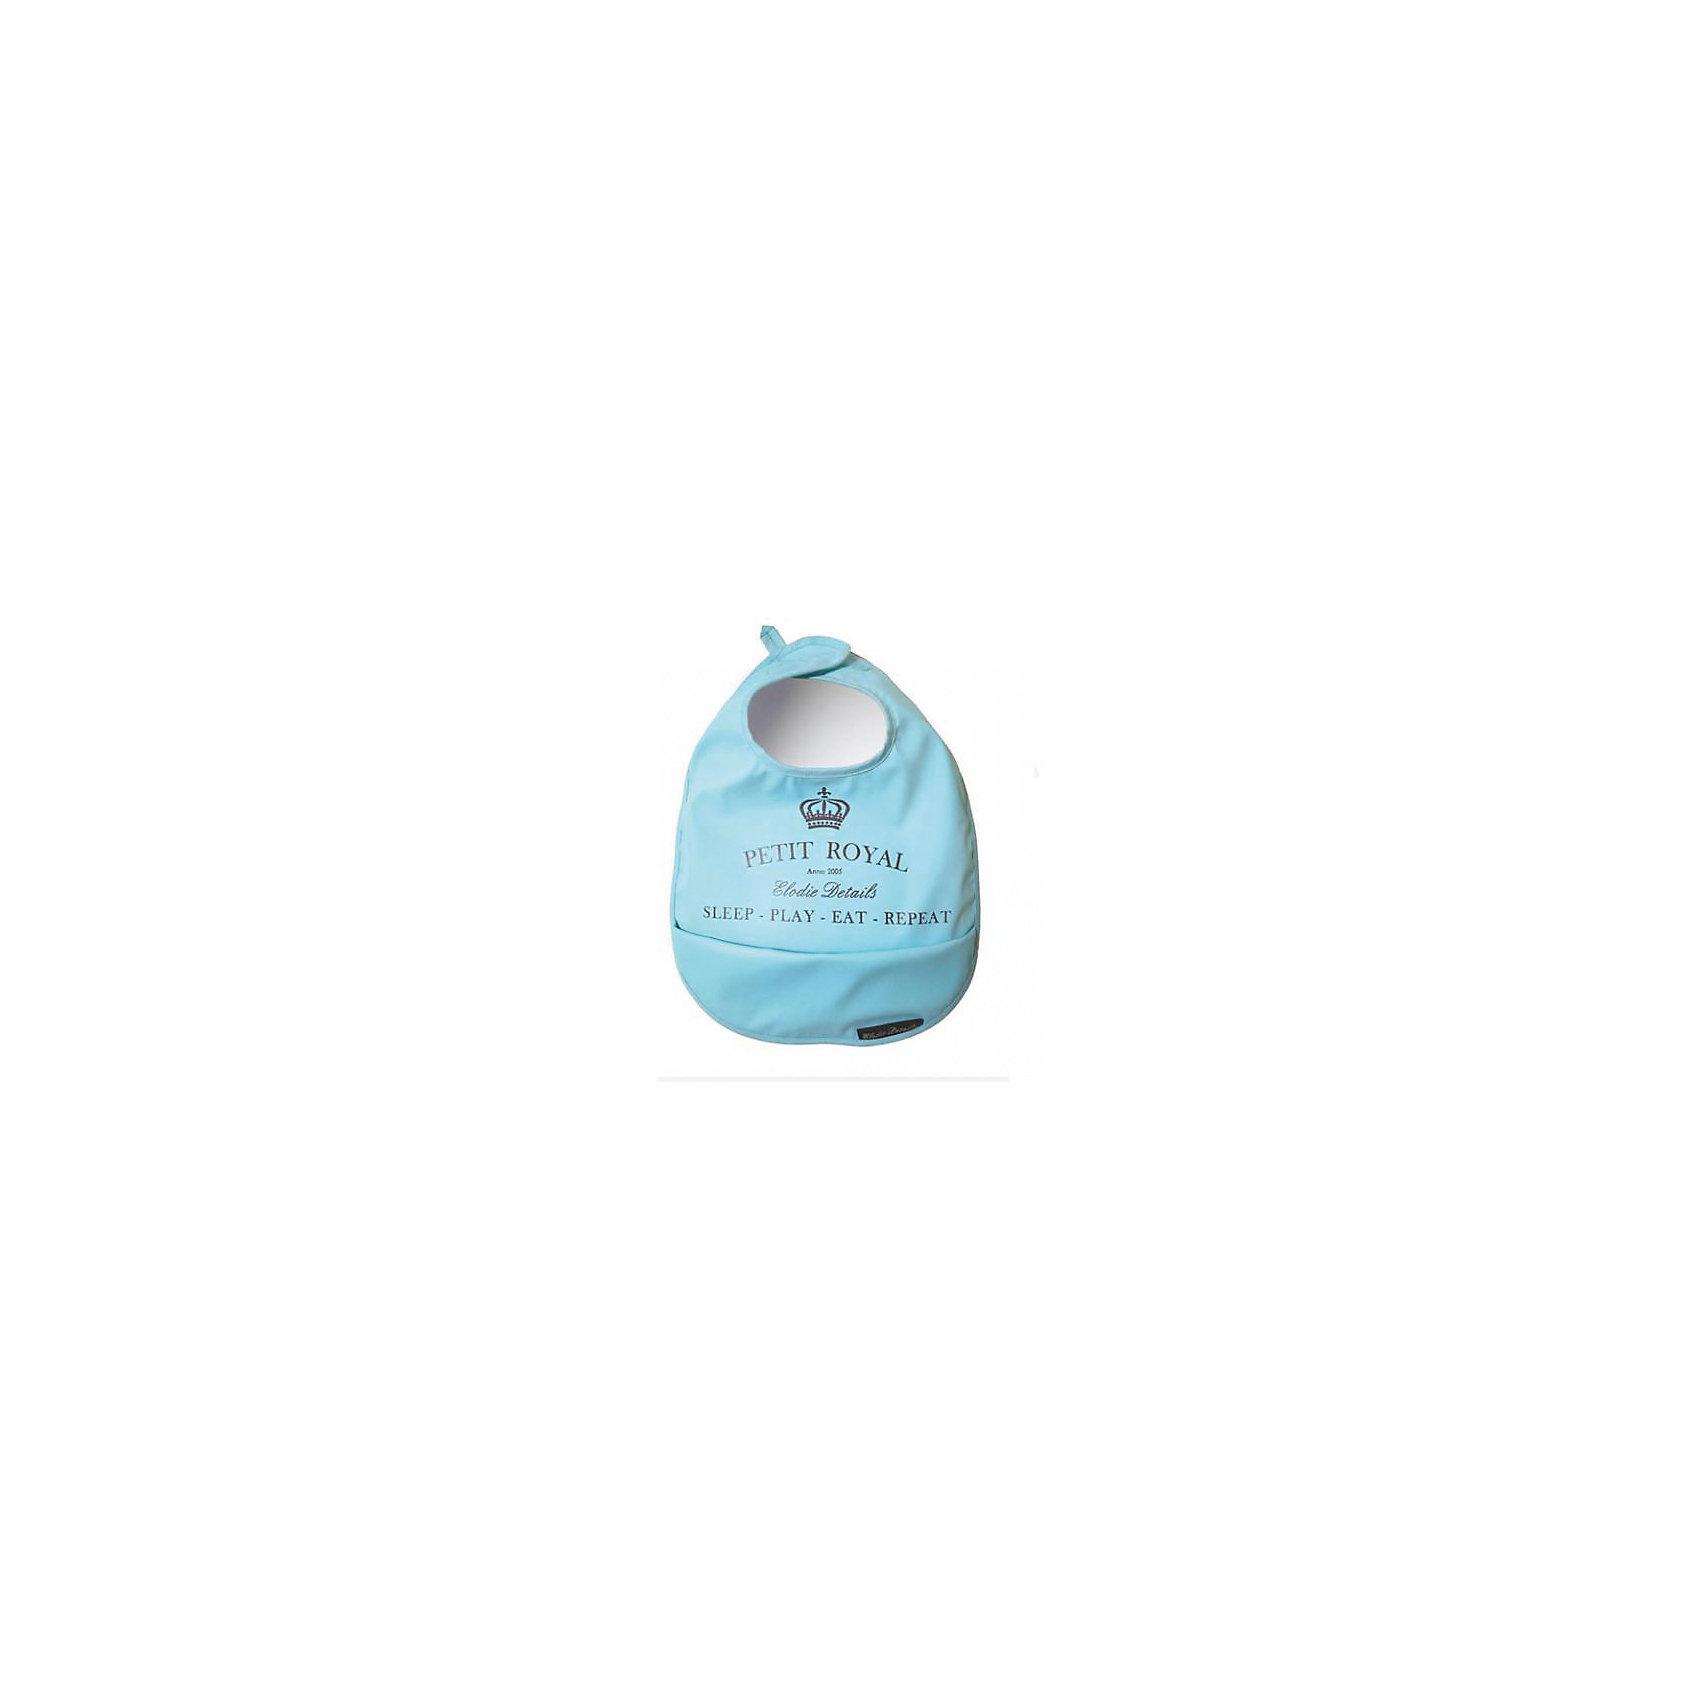 Нагрудник полиуретан Petit Royal Blue, ELODIE DETAILS